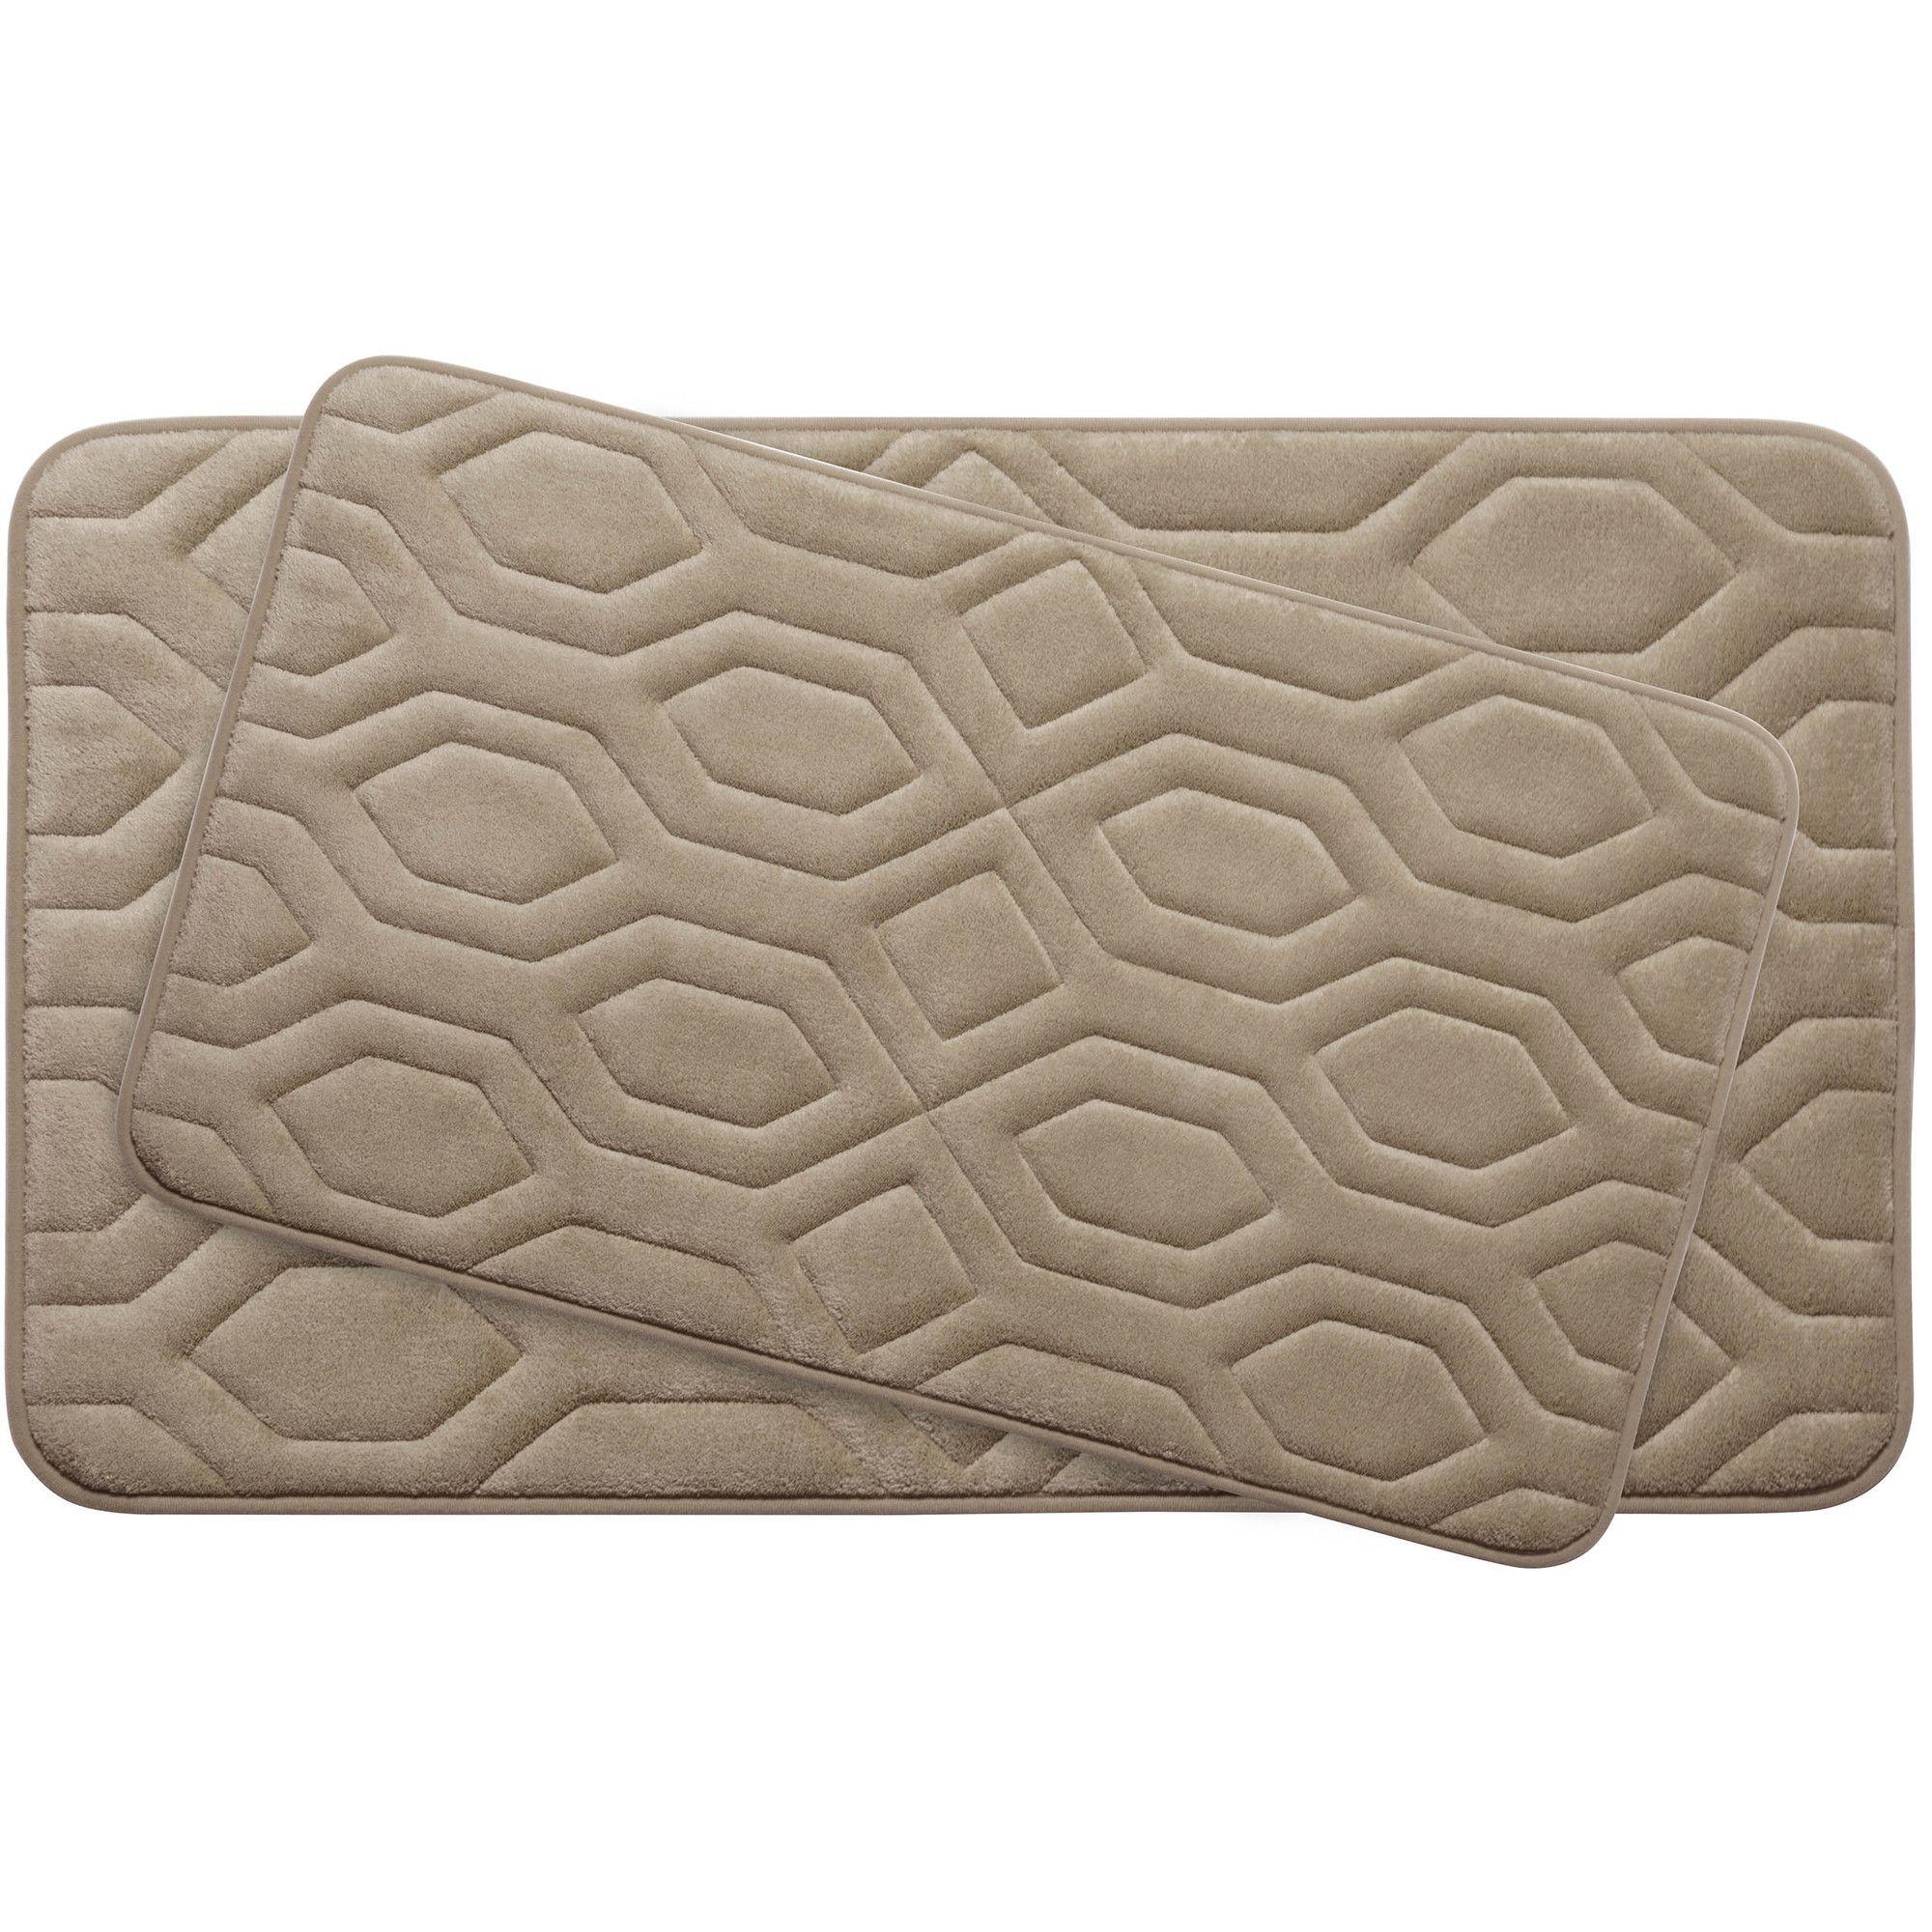 Turtle Shell Large 2 Piece Premium Micro Plush Memory Foam Bath